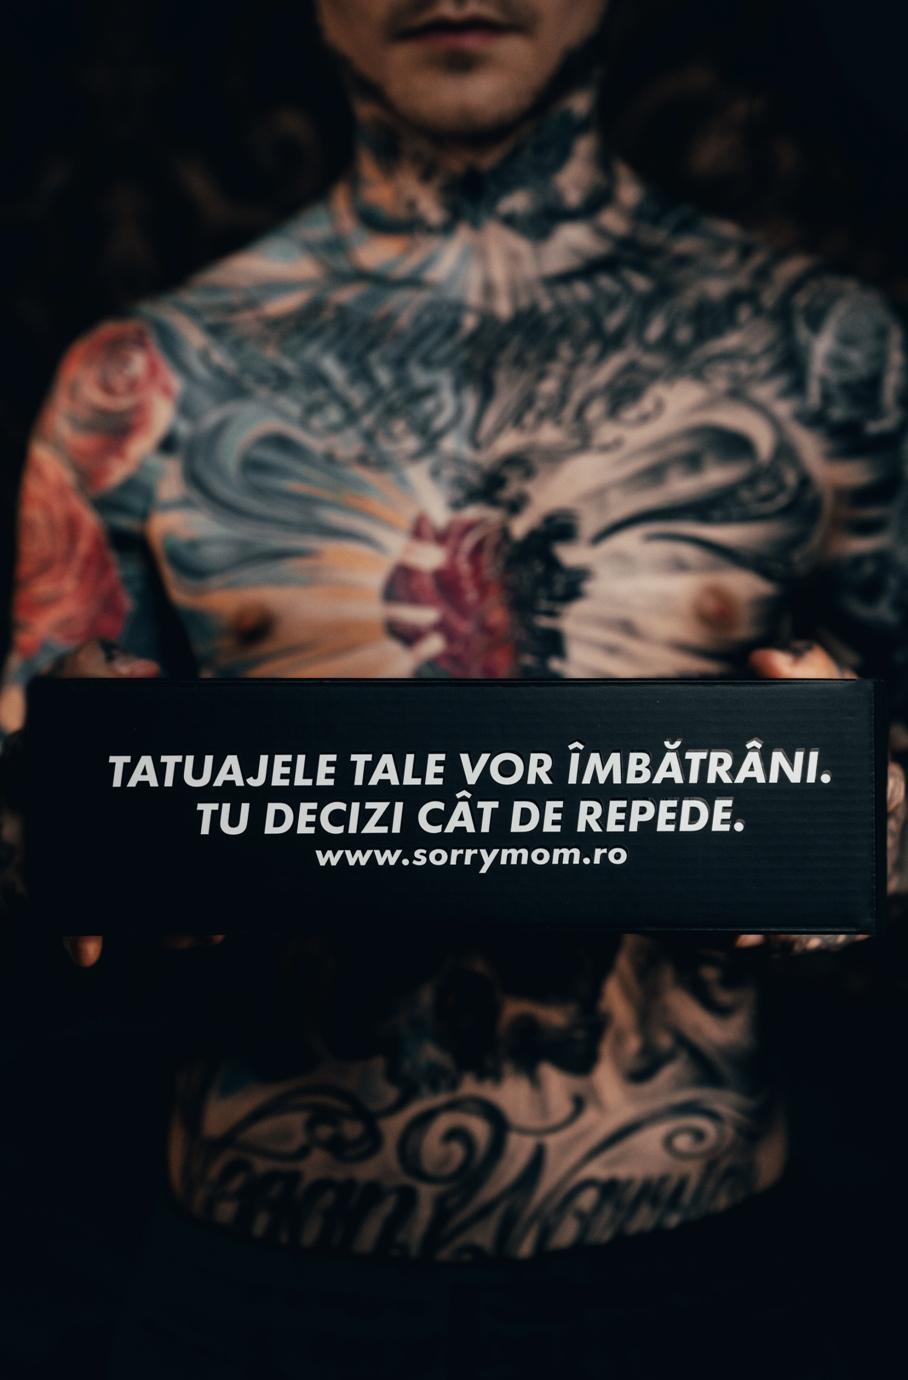 sorry-mom-romania-balsam-vindecare-kit-bucuresti-tattoo-tatuaje-salontatuaje-salon-tatuaj-vindecat-05